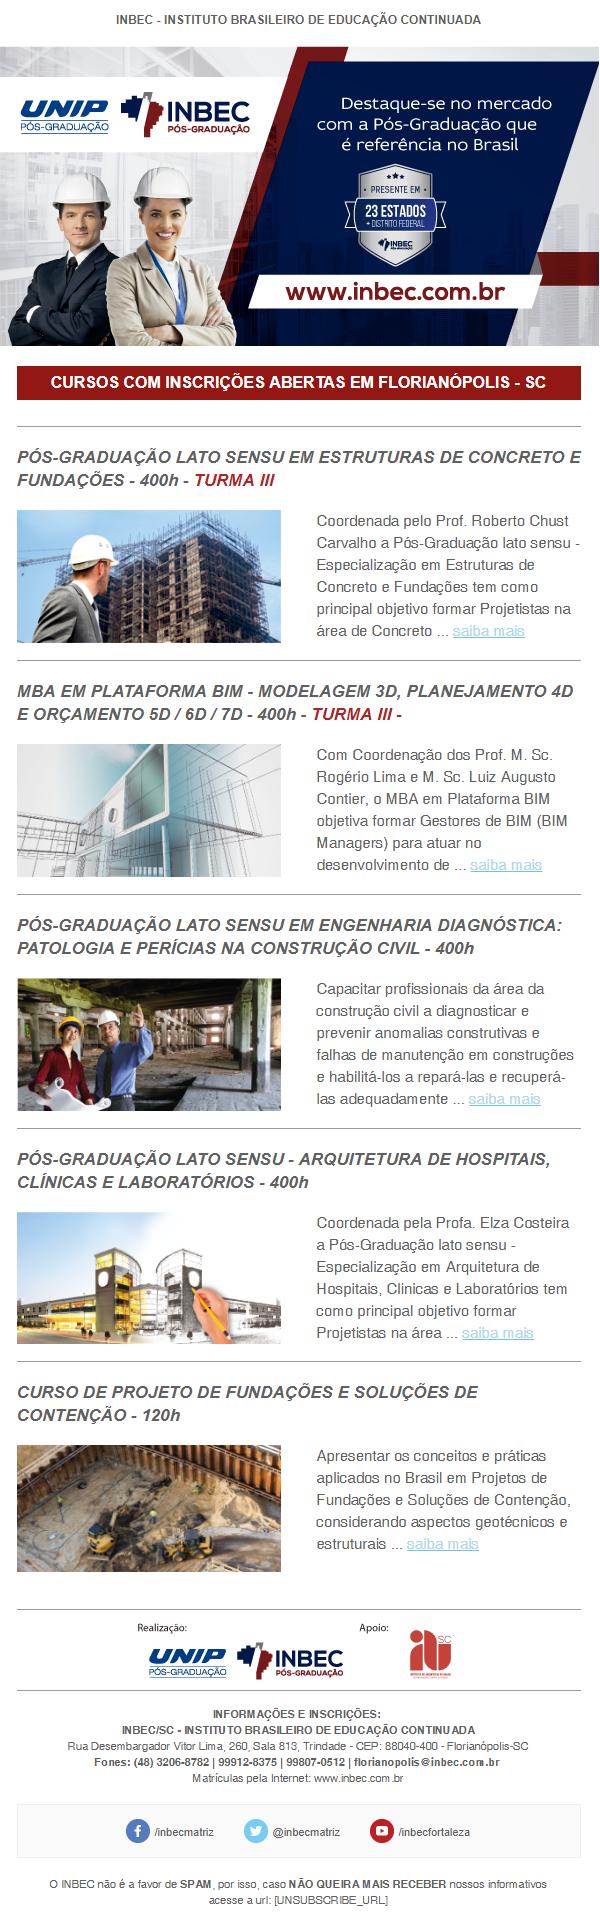 NEWSLETTER-CURSOS-FLORIANOPOLIS-IAB